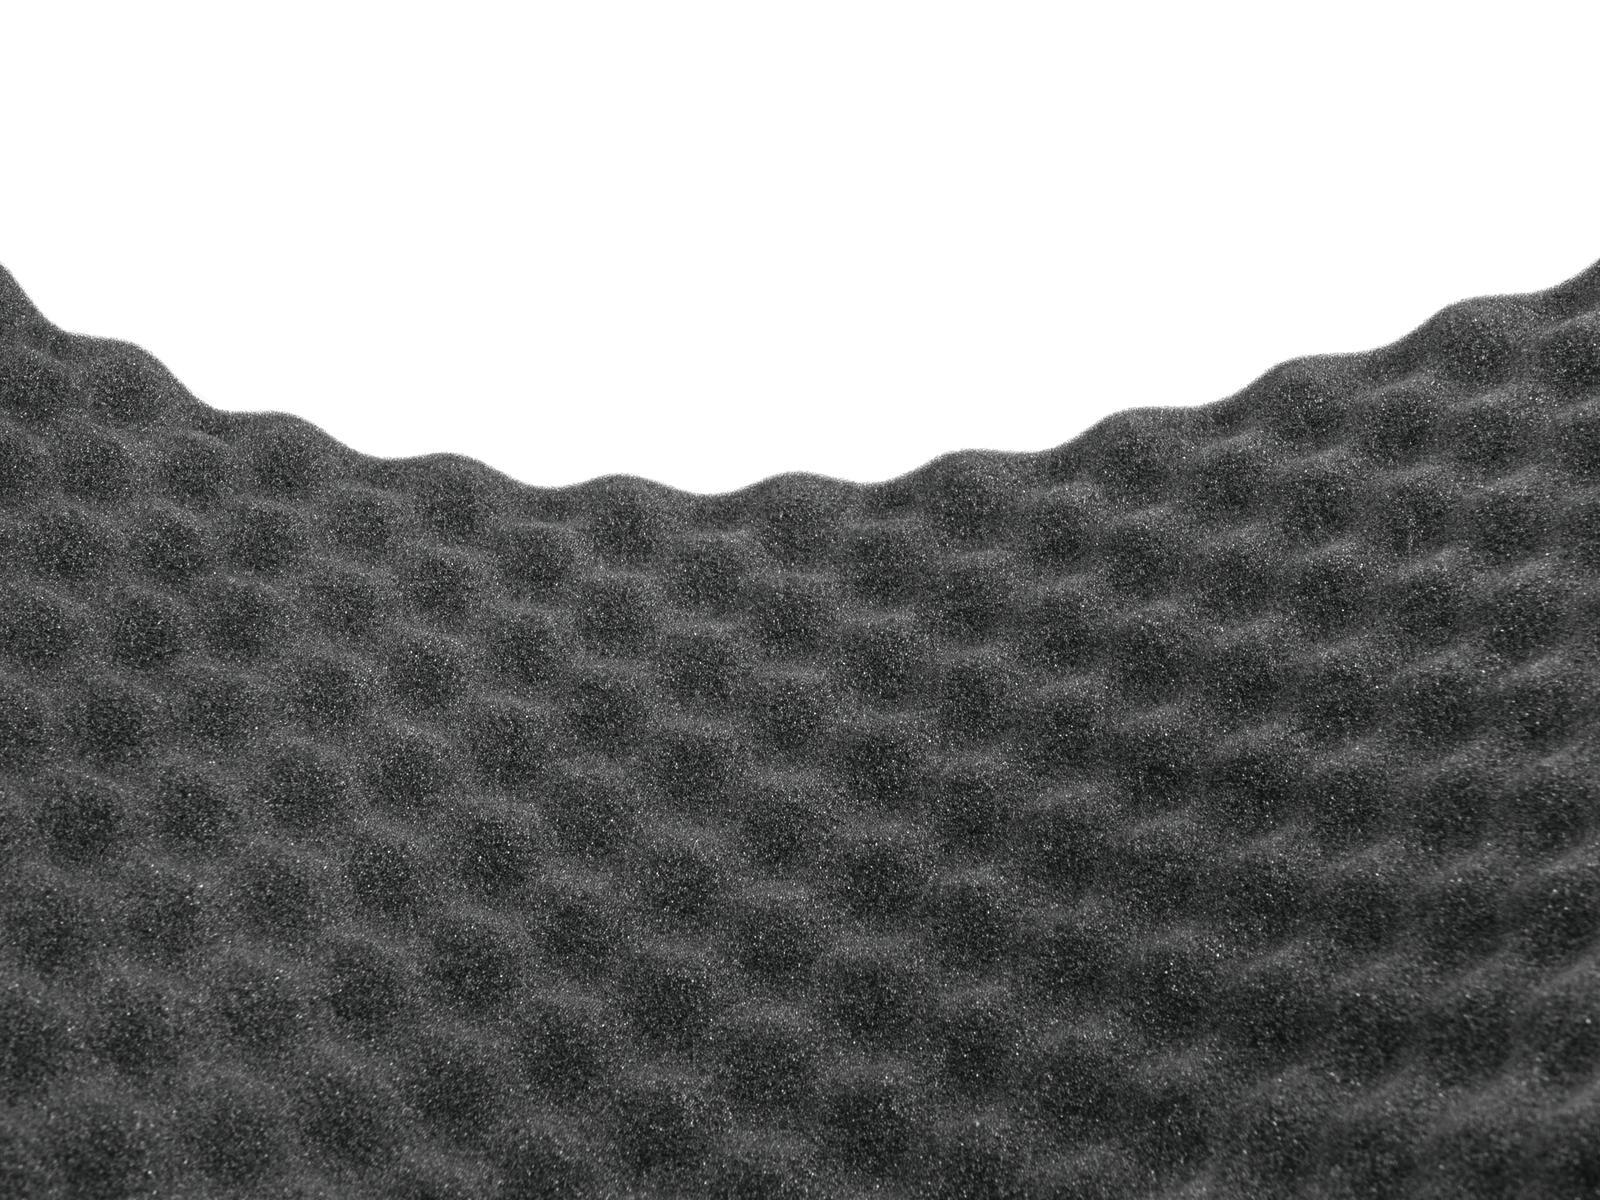 ACCESSORY Isoliermatte, Noppen Höhe 20mm, 50x100cm